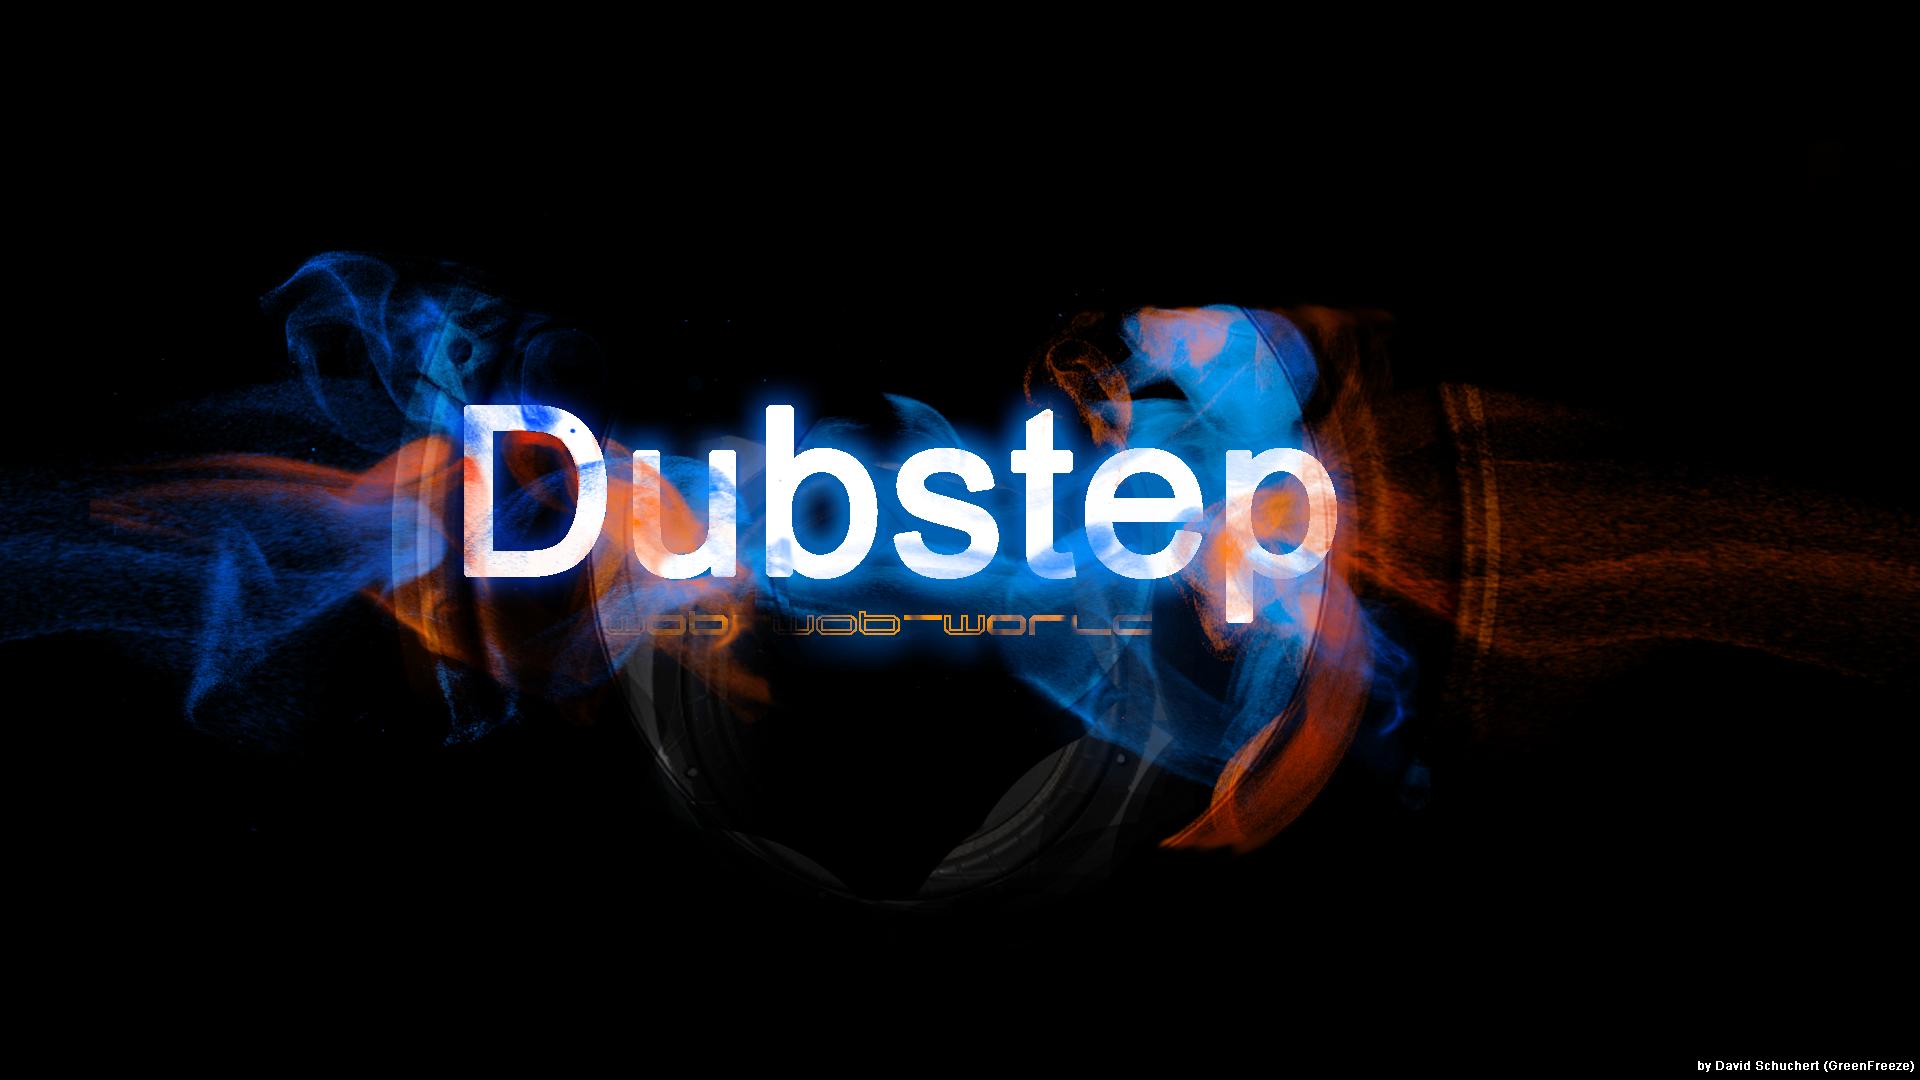 dubstep_wallpaper_by_greenfreeze-d5gv8pc.png 1.920×1.080 pixels